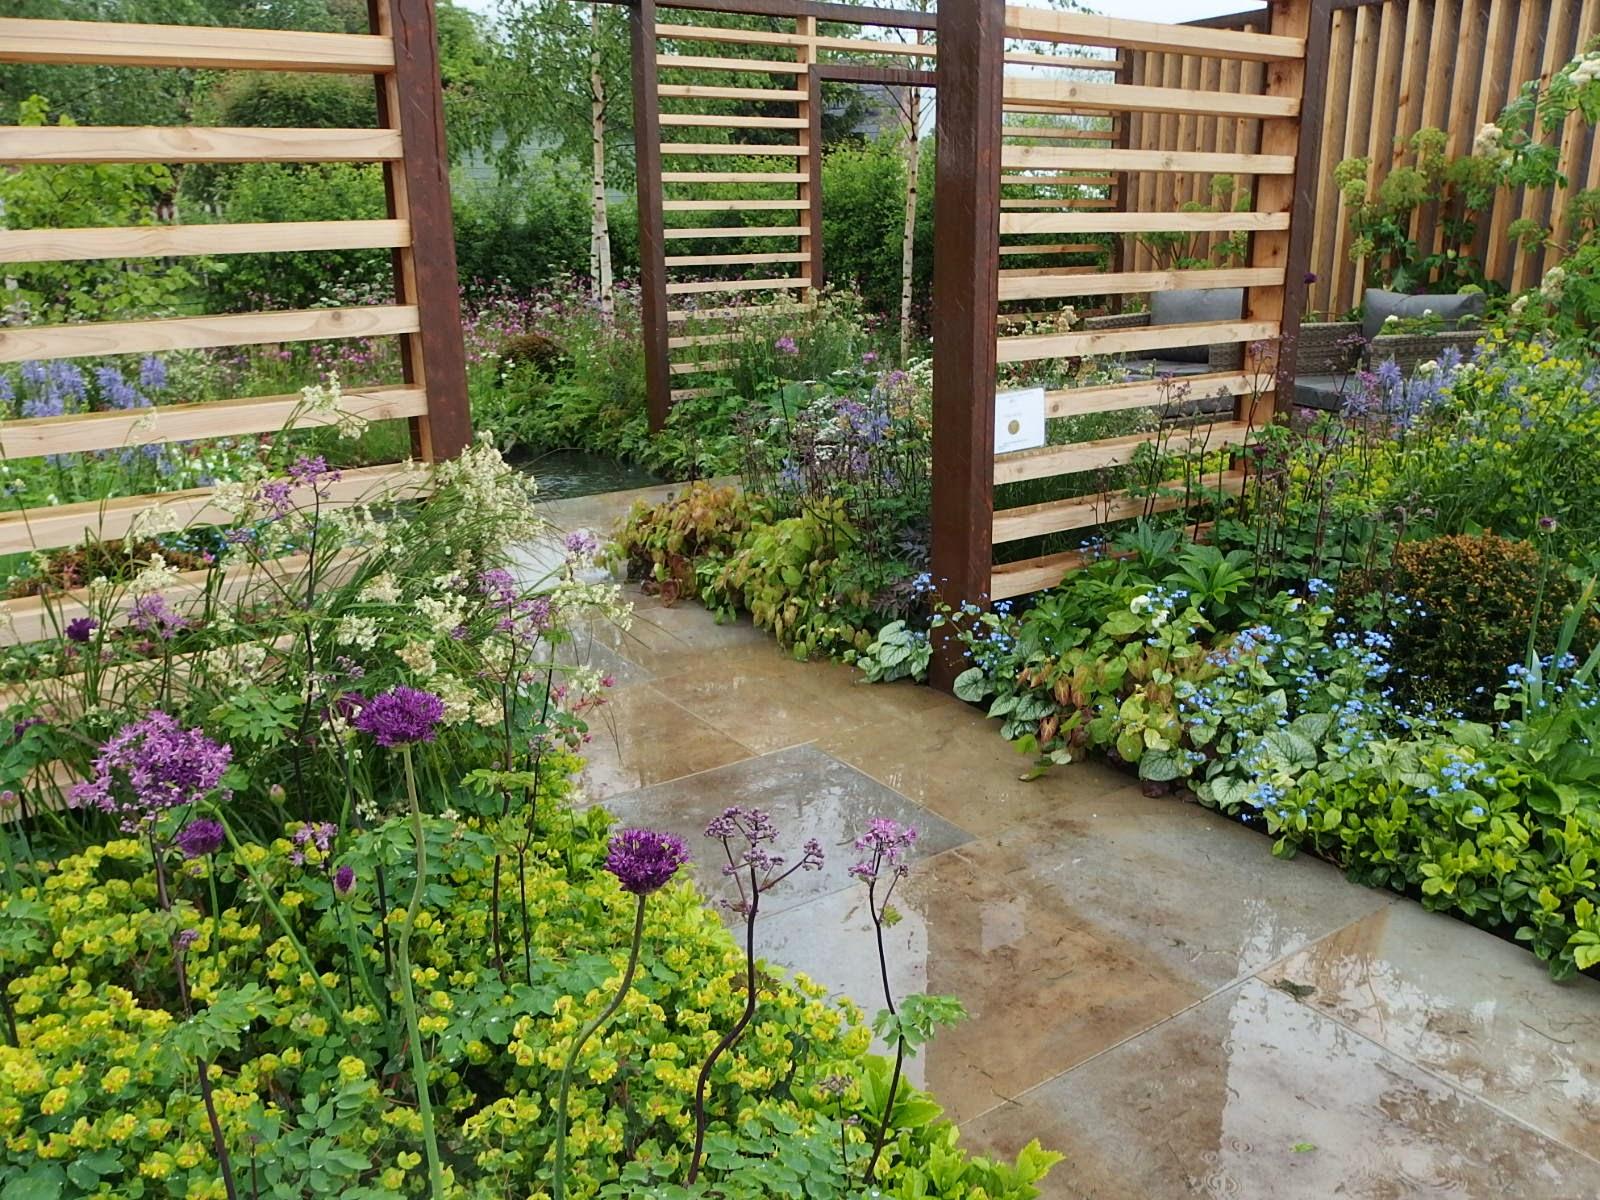 1000 images about garden divider ideas on pinterest for Garden divider ideas